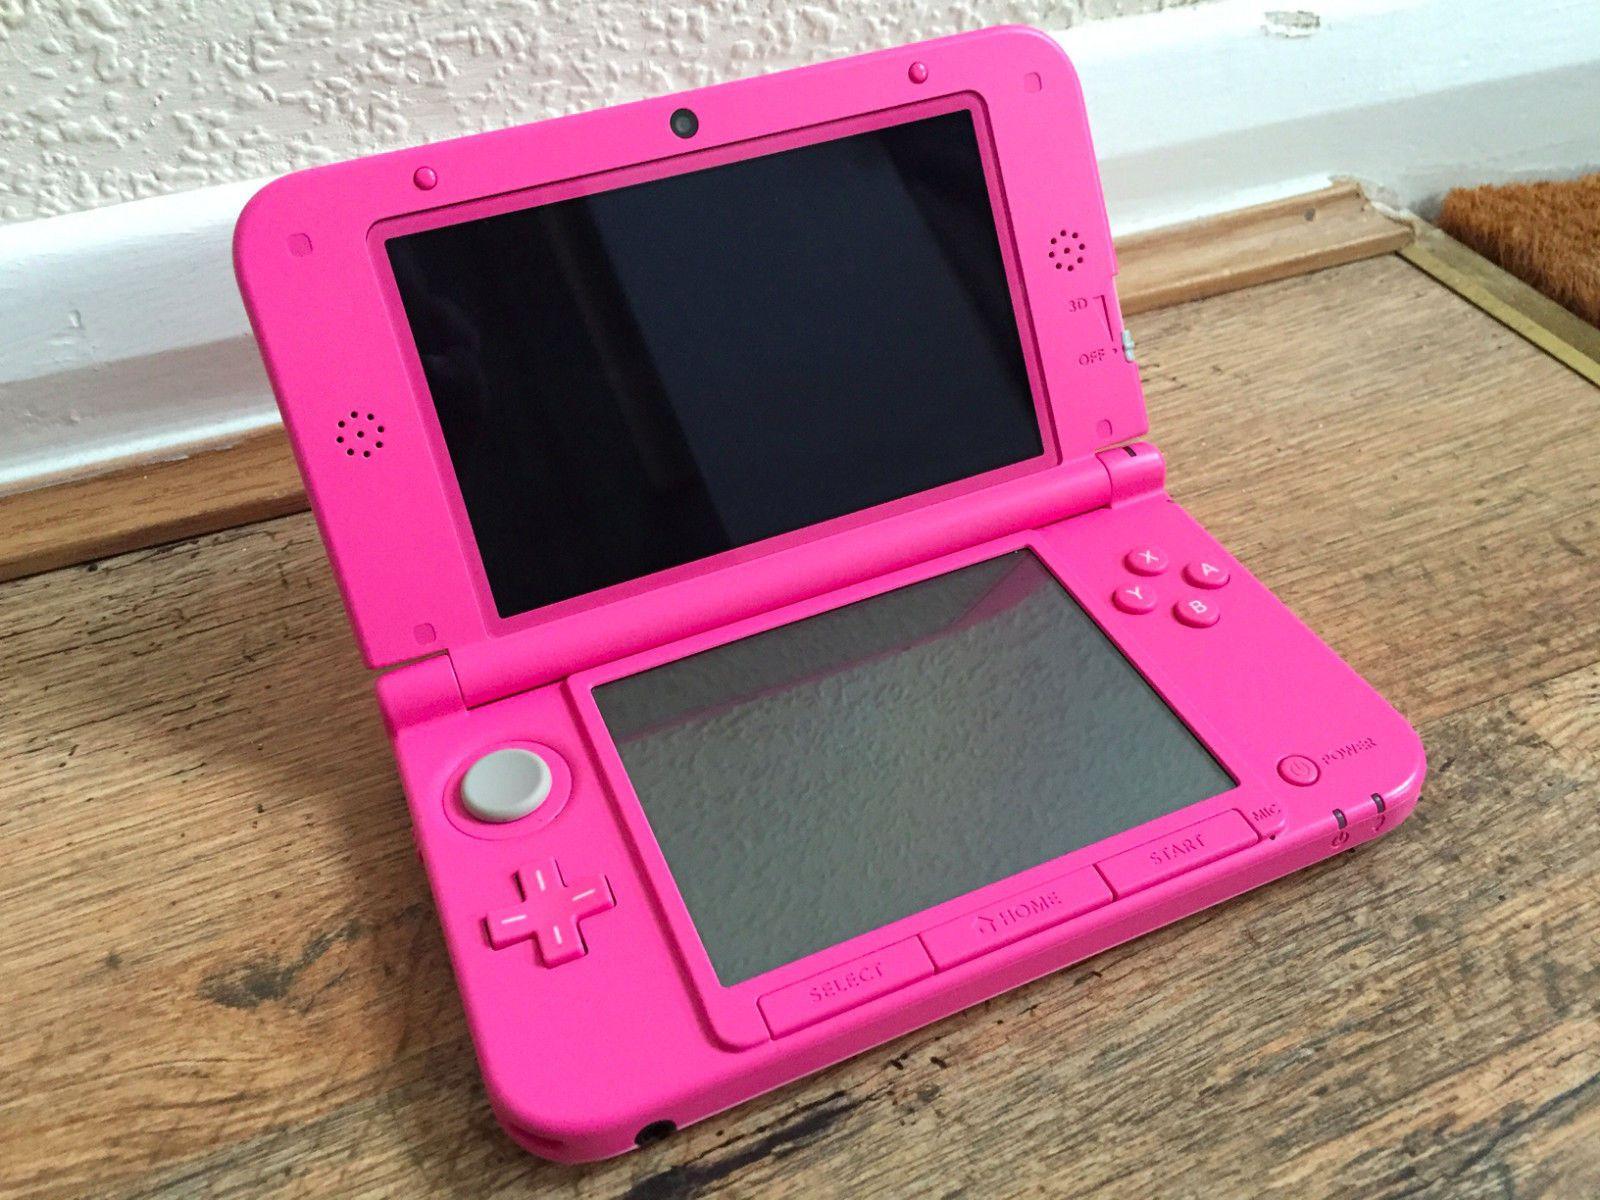 Nintendo 3DS XL Pink Console in great condition https://t.co/JVVyZxpLut https://t.co/MJ73lUE2cU